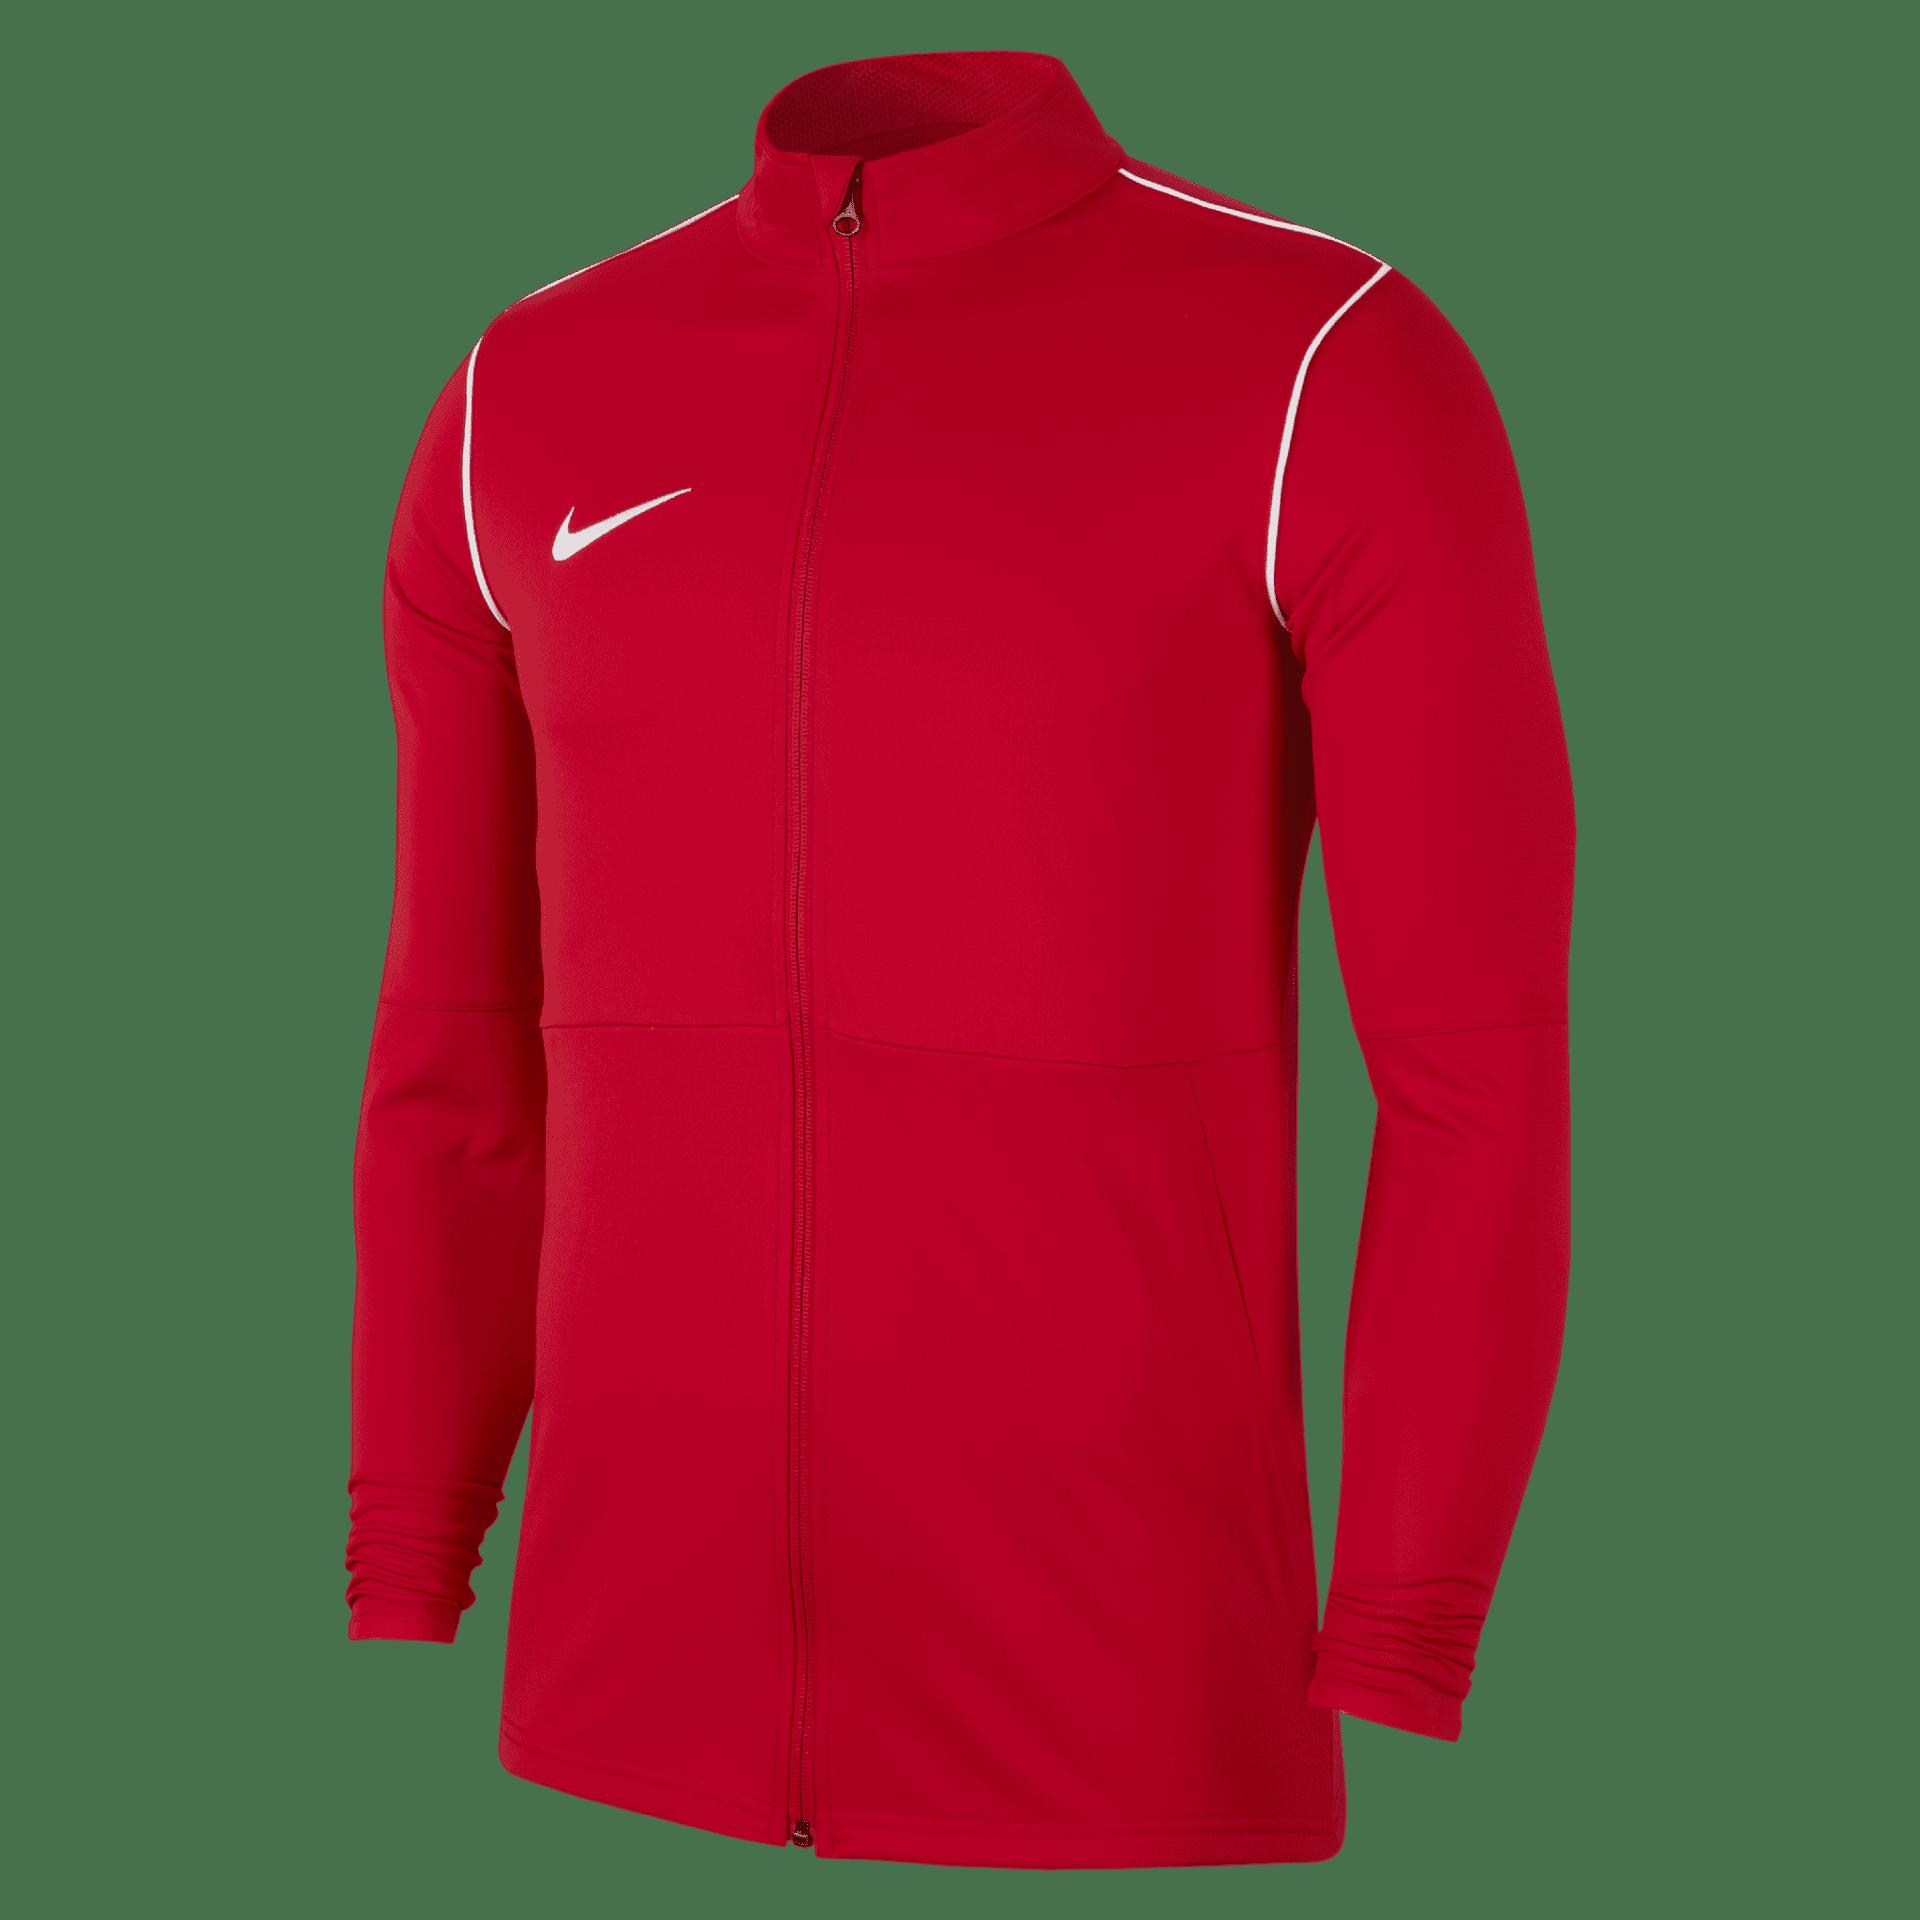 nike park 20 knit track jacket size xxl mens 28625 p